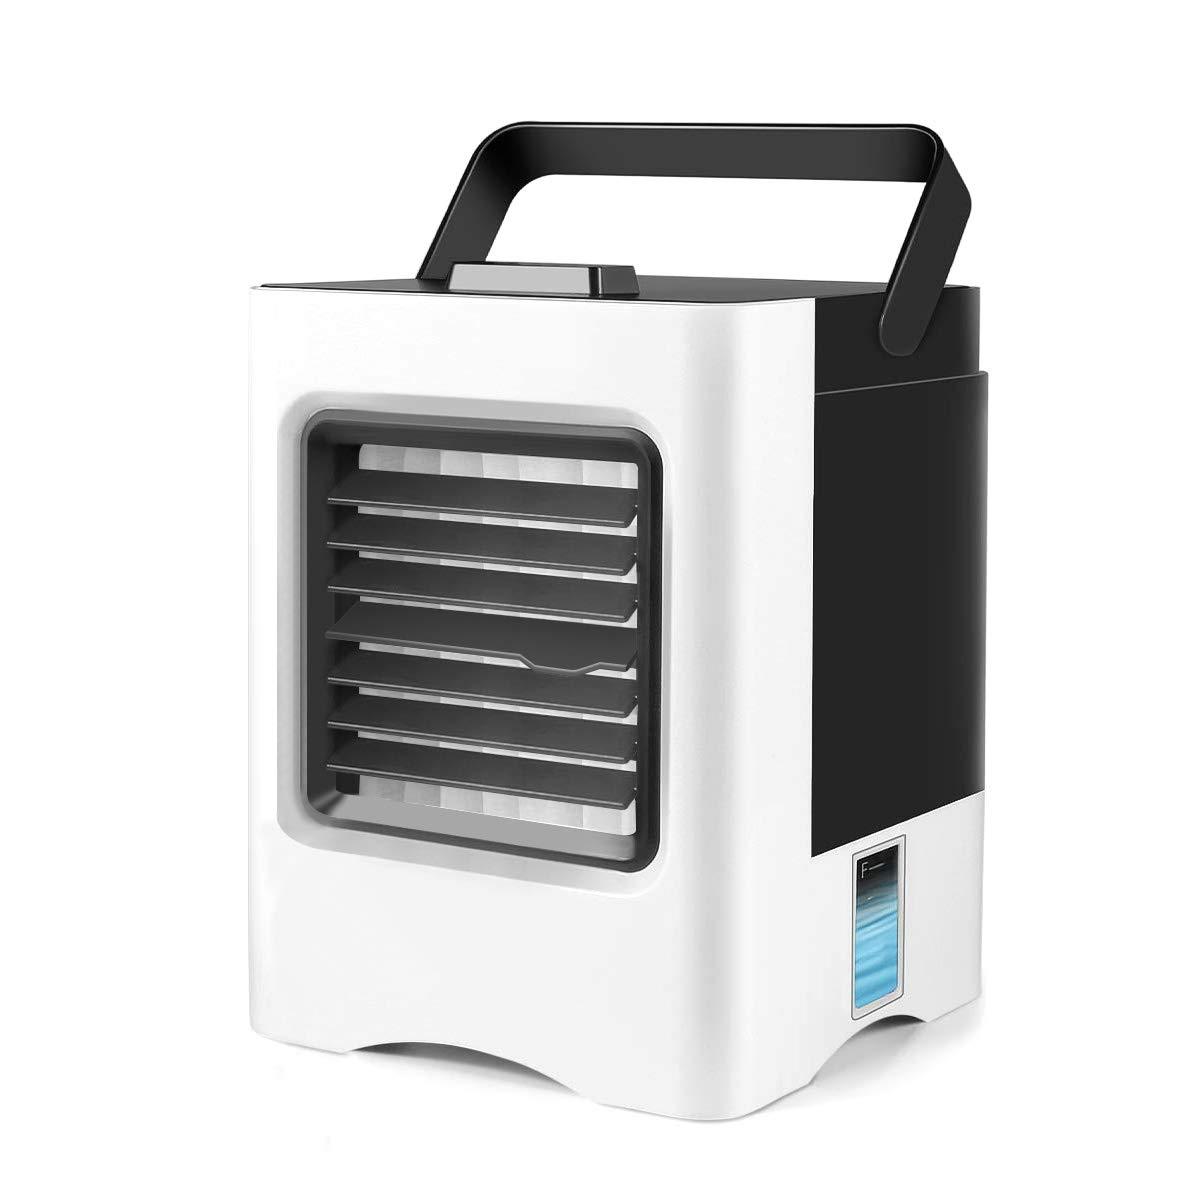 Amazon WHD diverse mini air cooler 4-5€